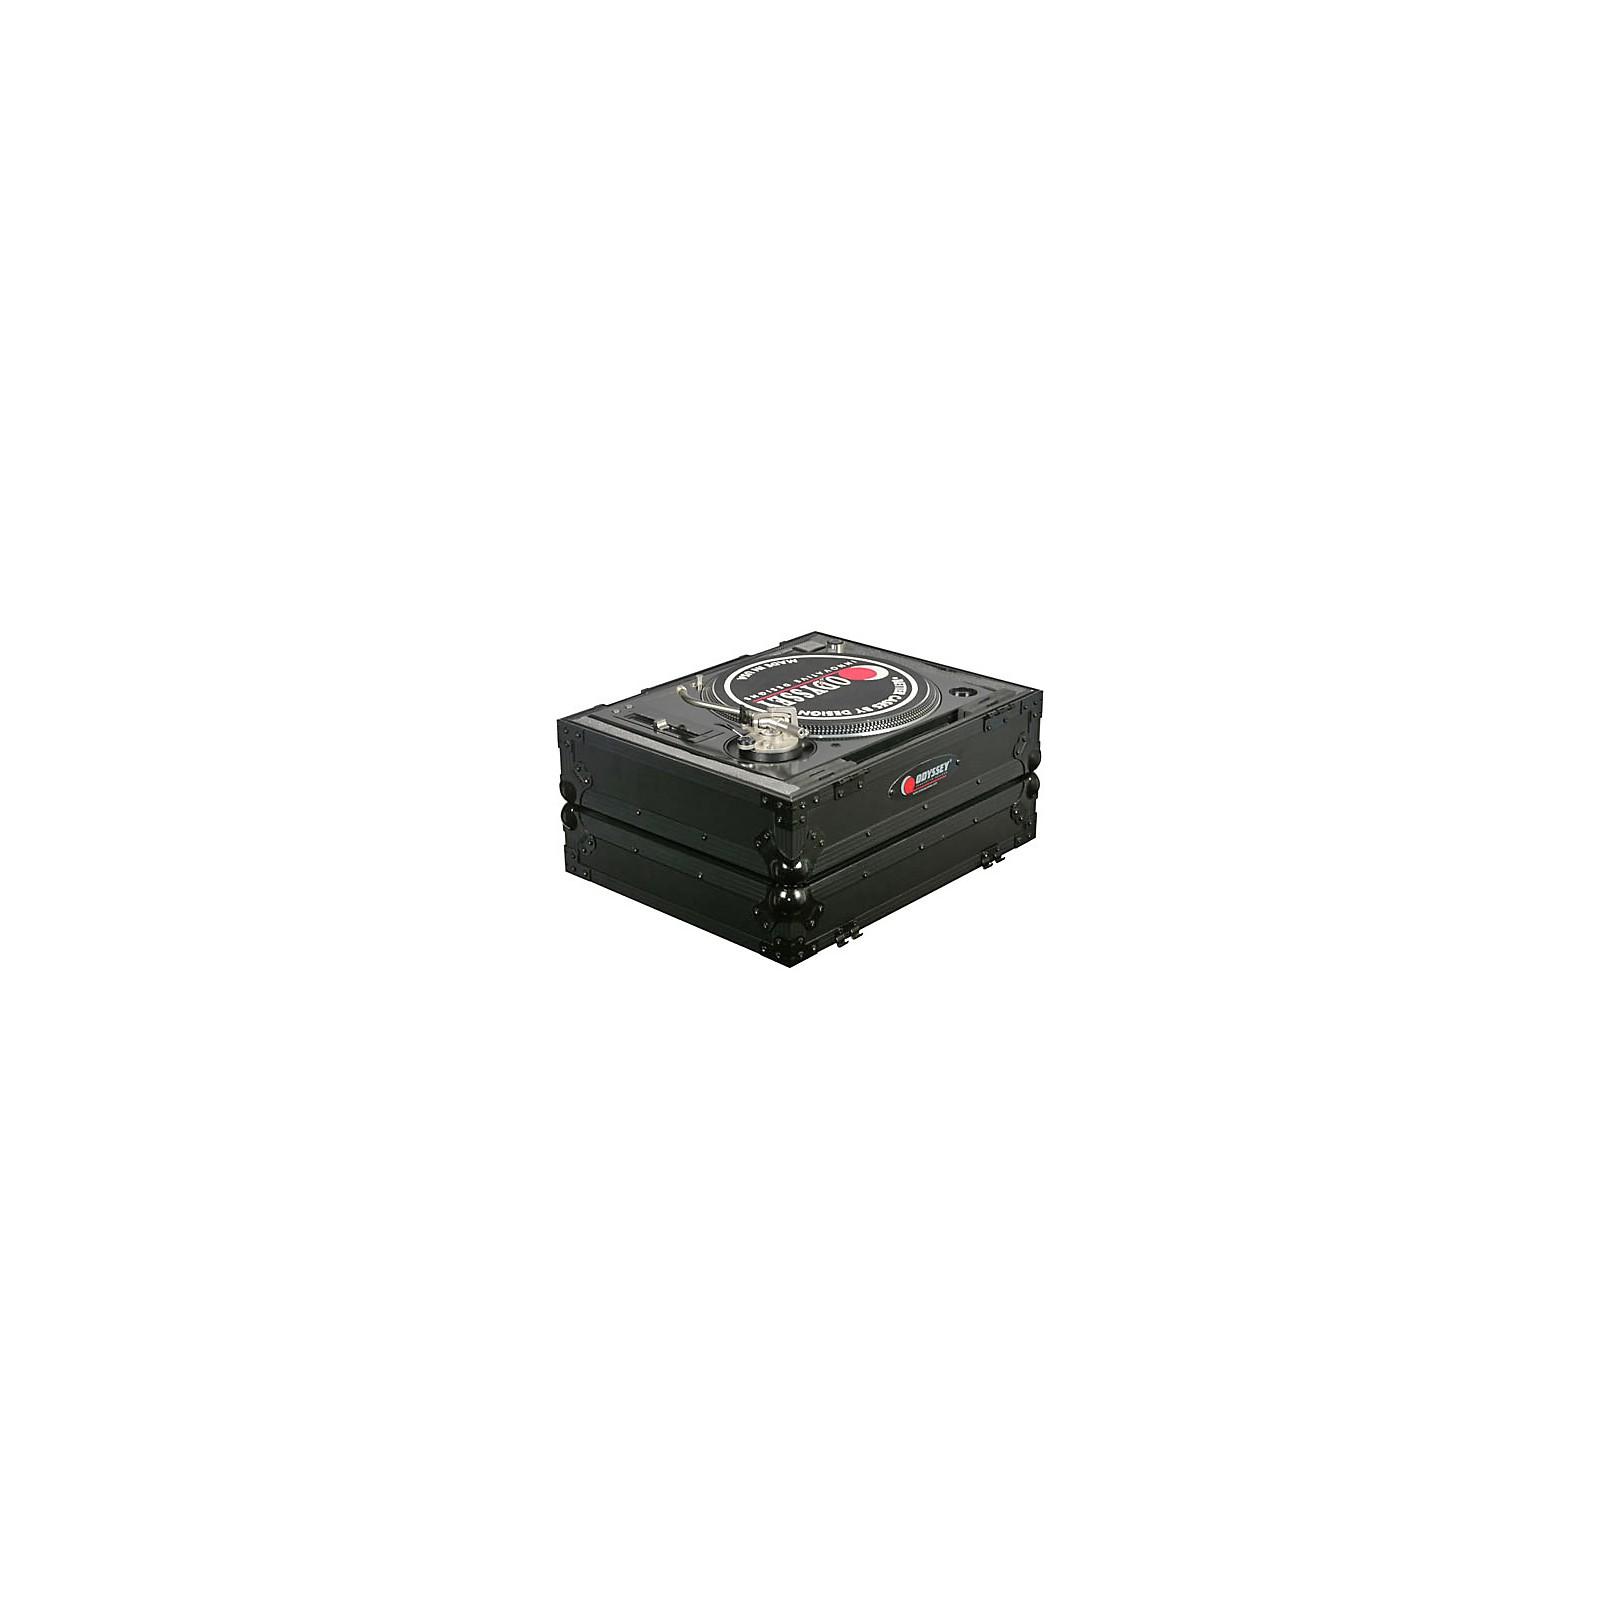 Odyssey Black Label FZ1200BL Universal Flight Case for 1200-Style DJ Turntable